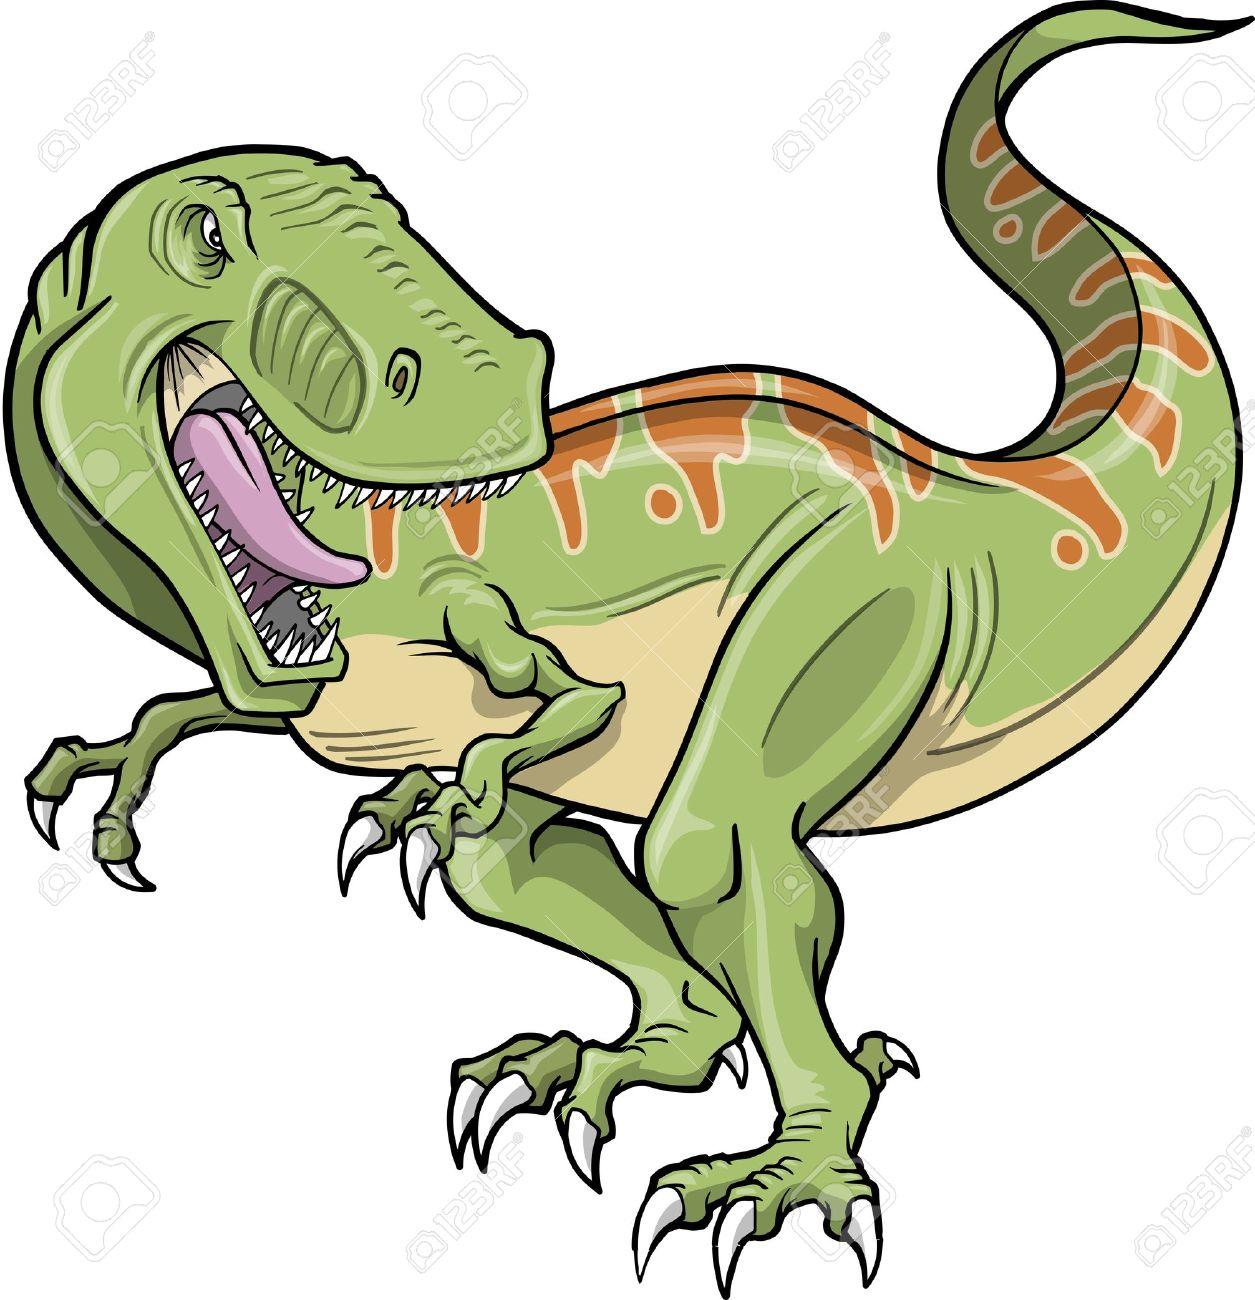 Jurassic park t rex clipart.